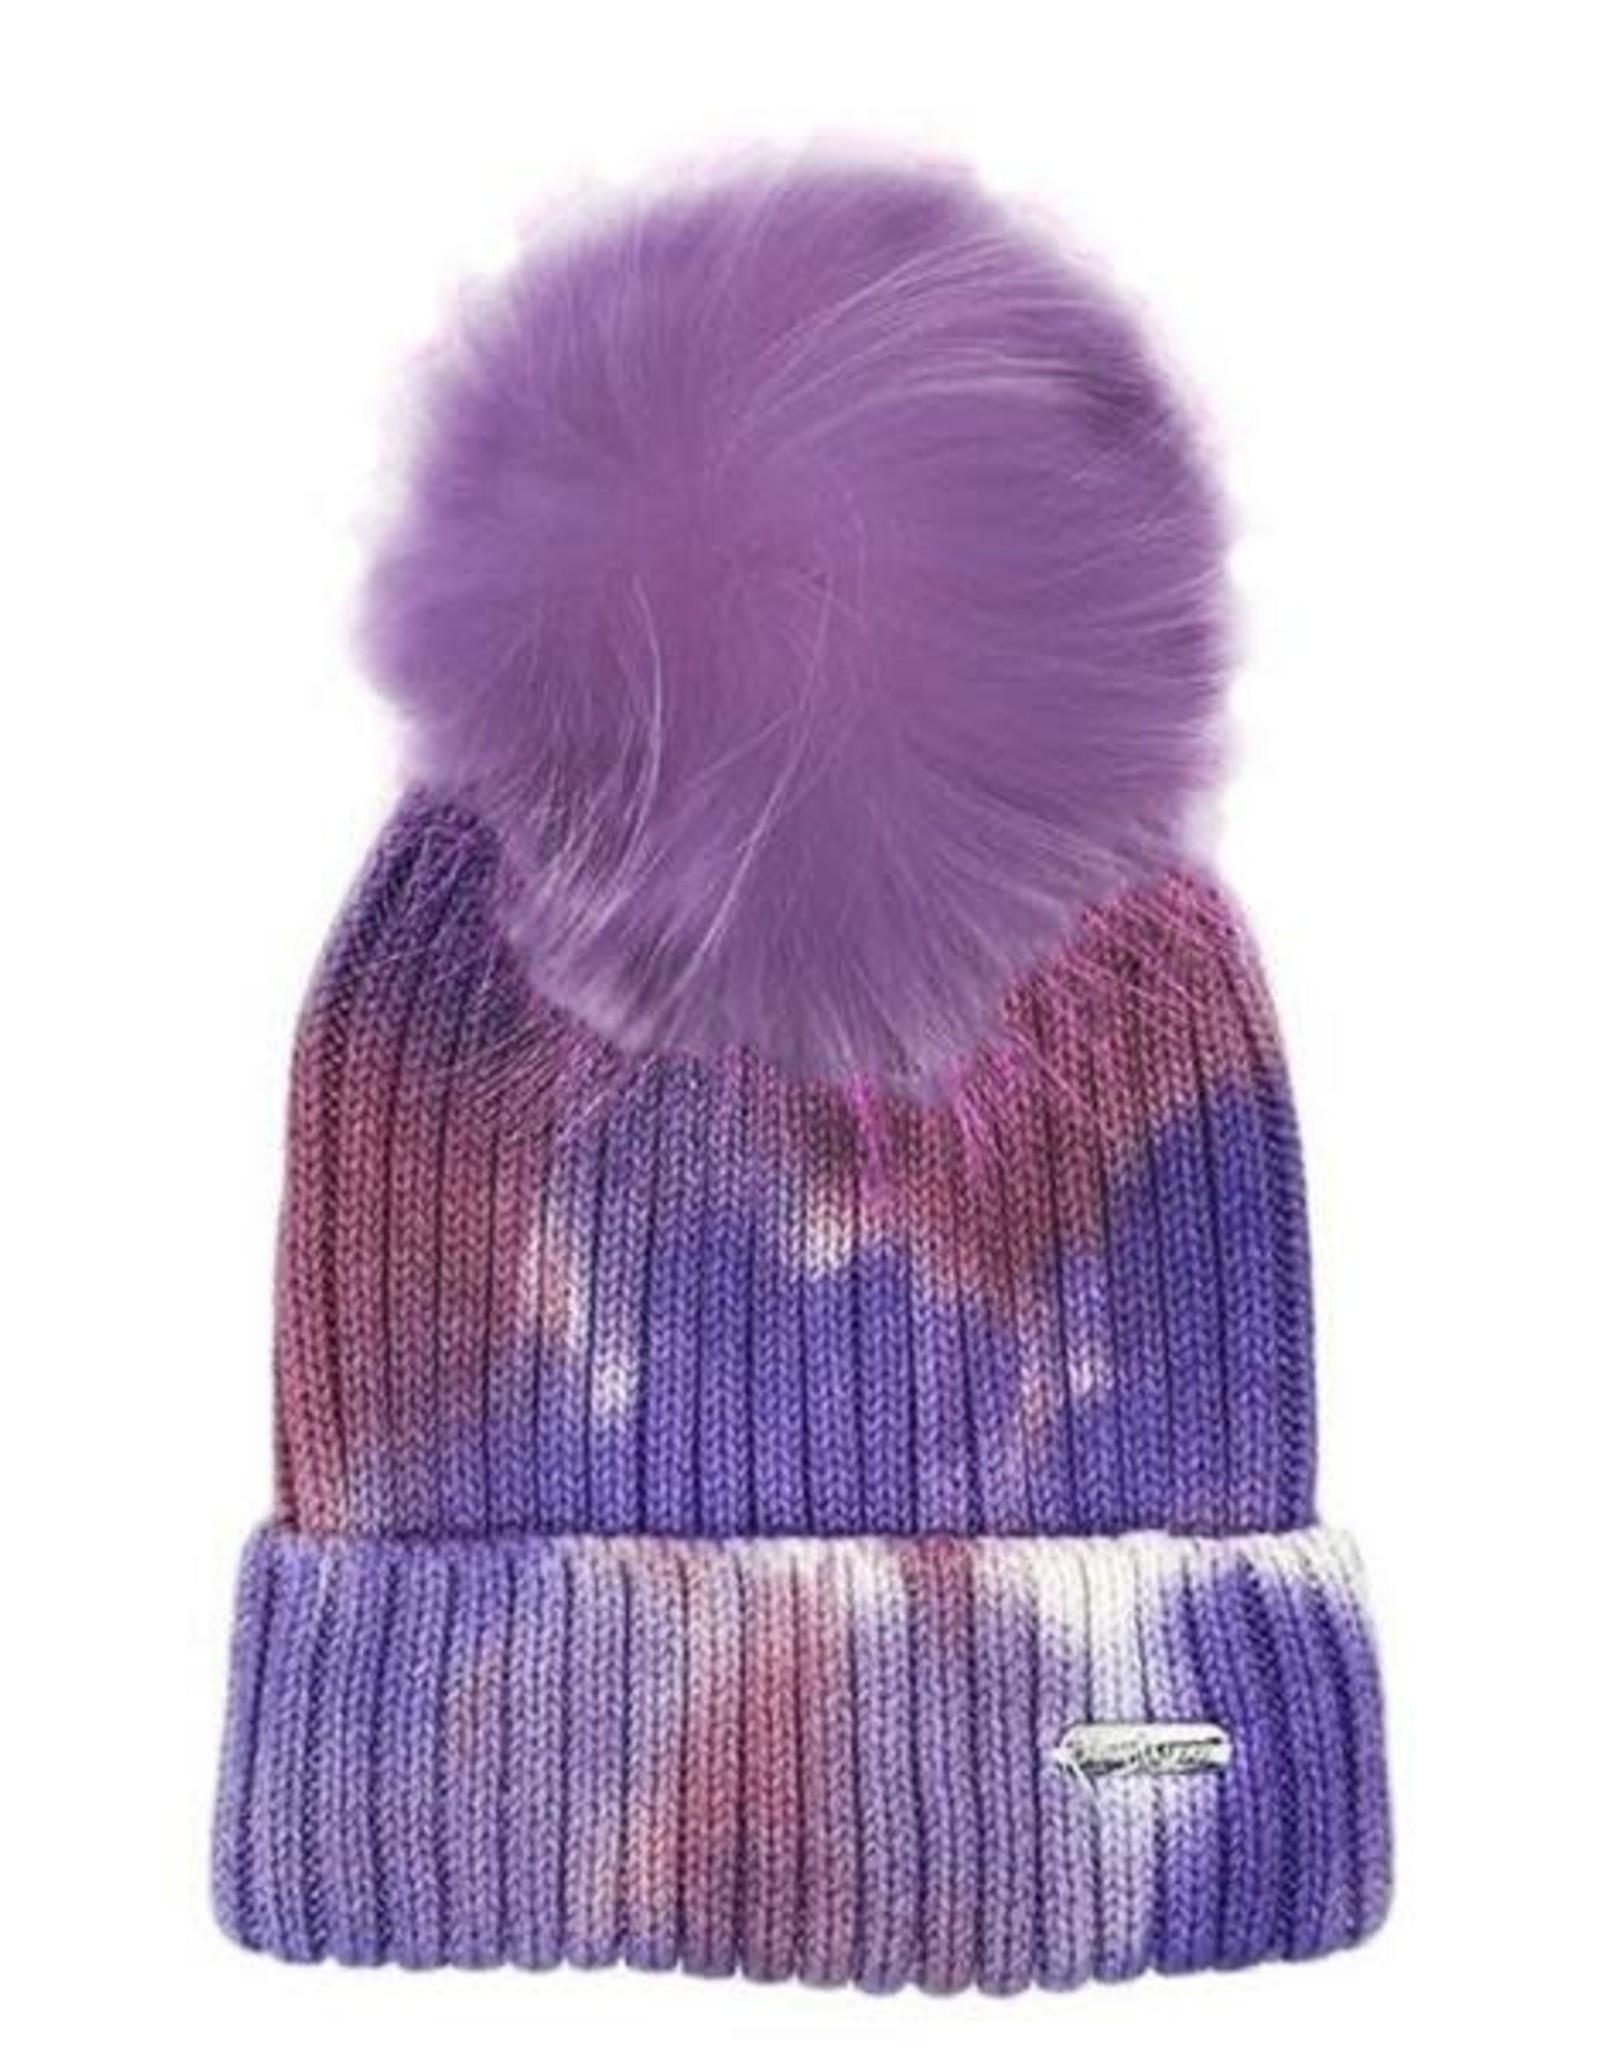 Bari Lynn Tie Dye Winter Hat Purple - Toddler